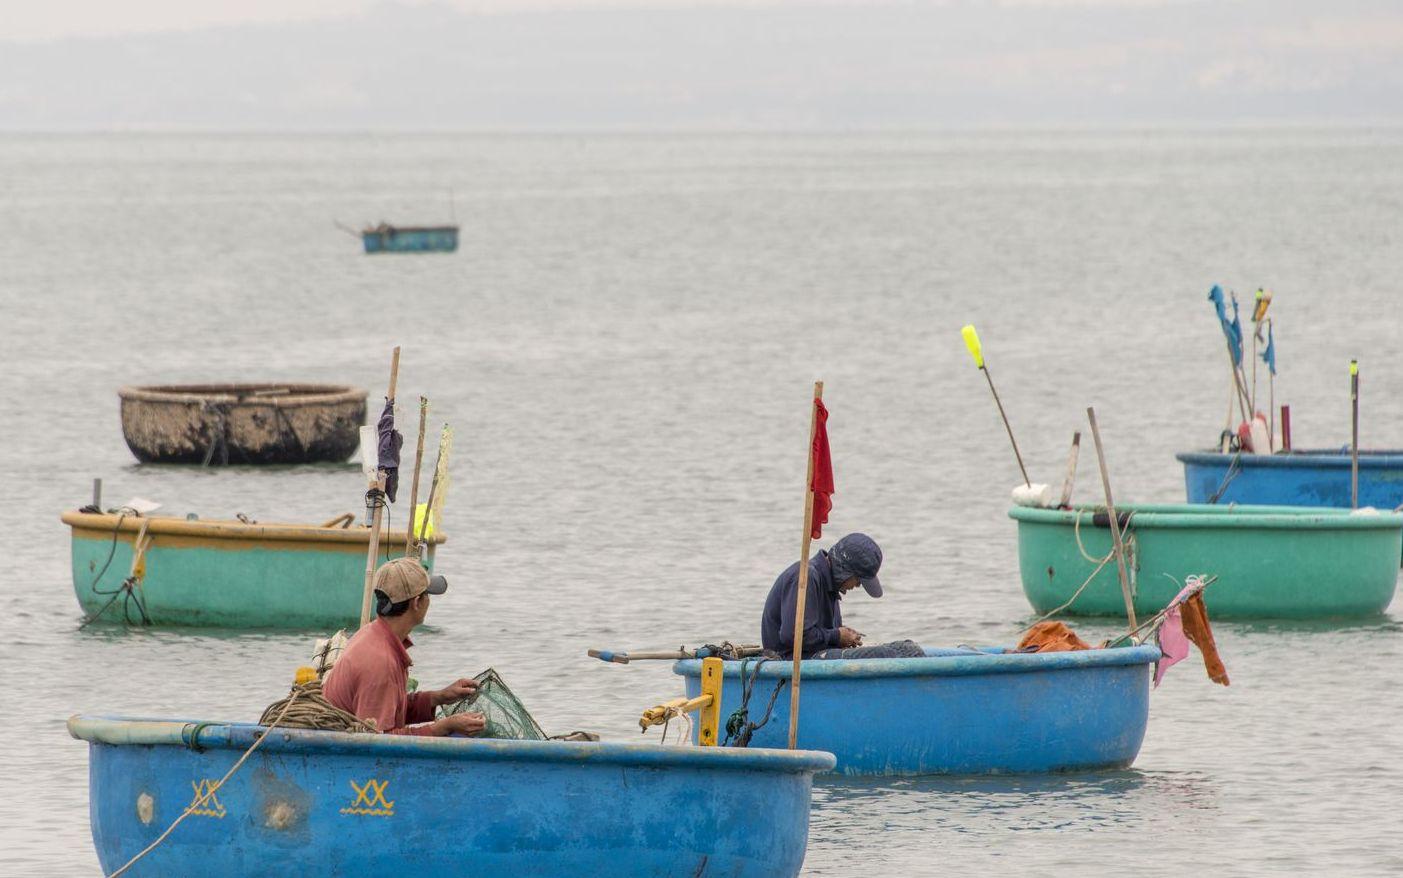 Лодки тазики рыбаков во Вьетнаме